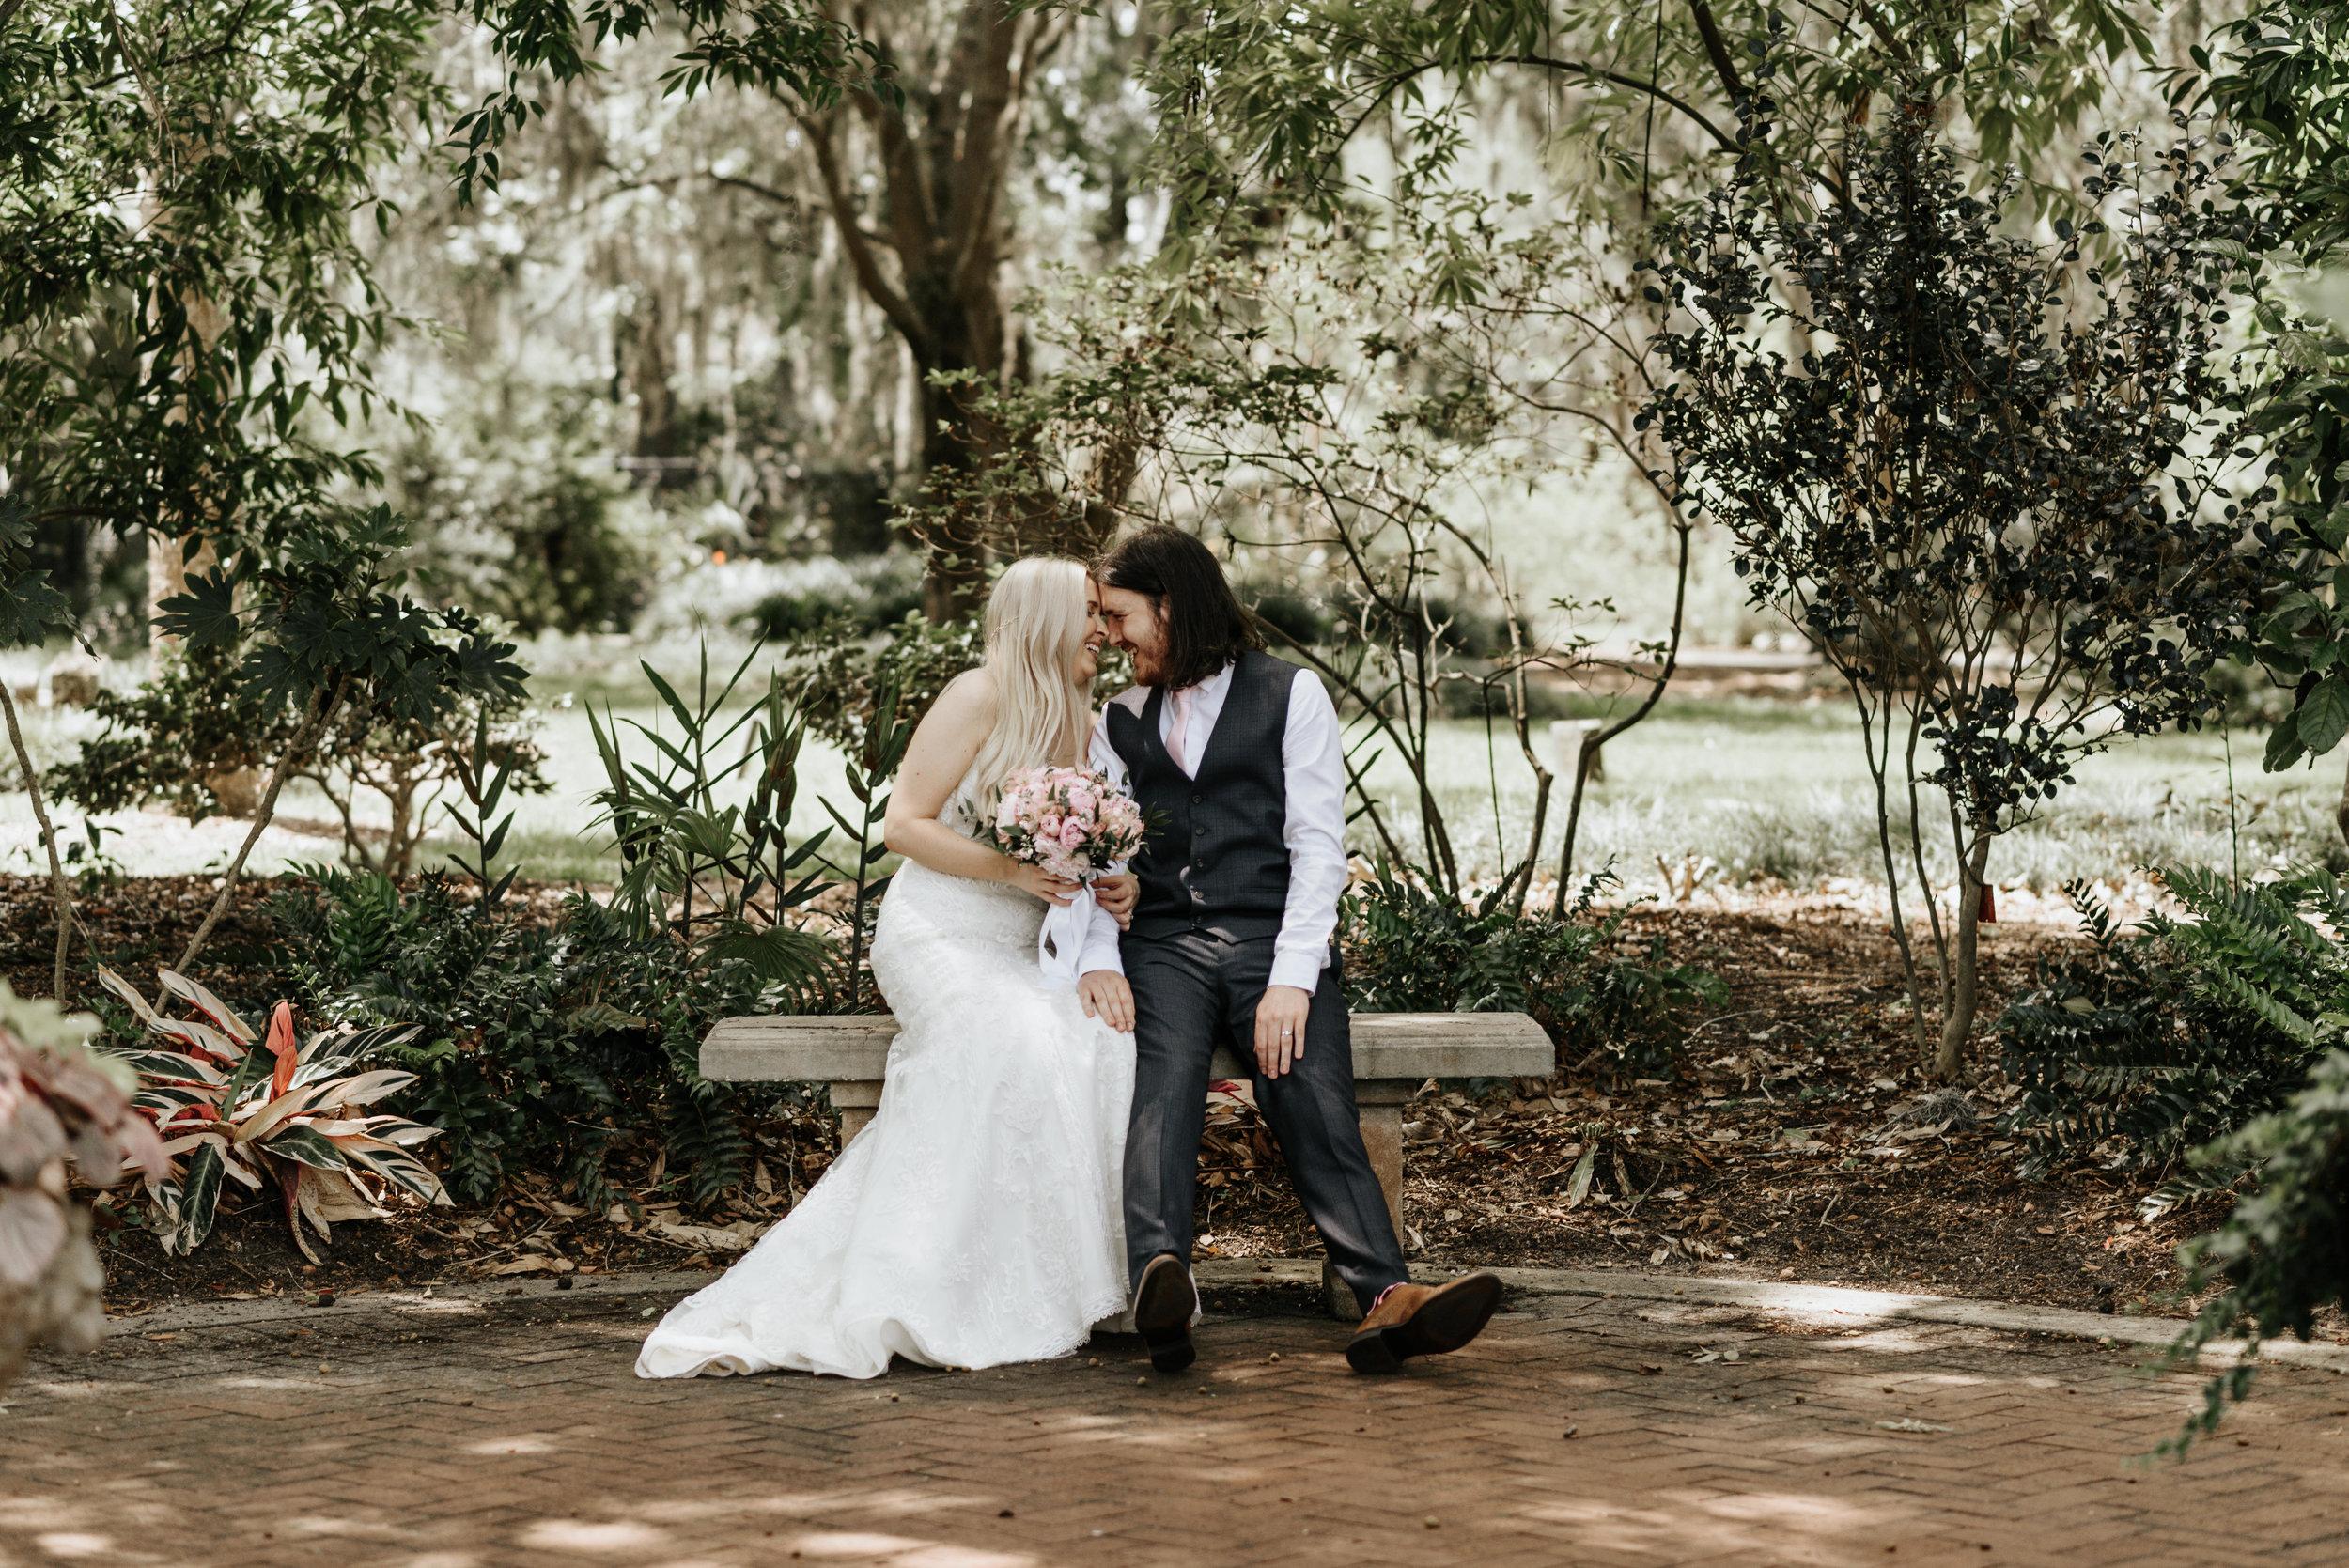 Lora-Richard-Wedding-1243.jpg